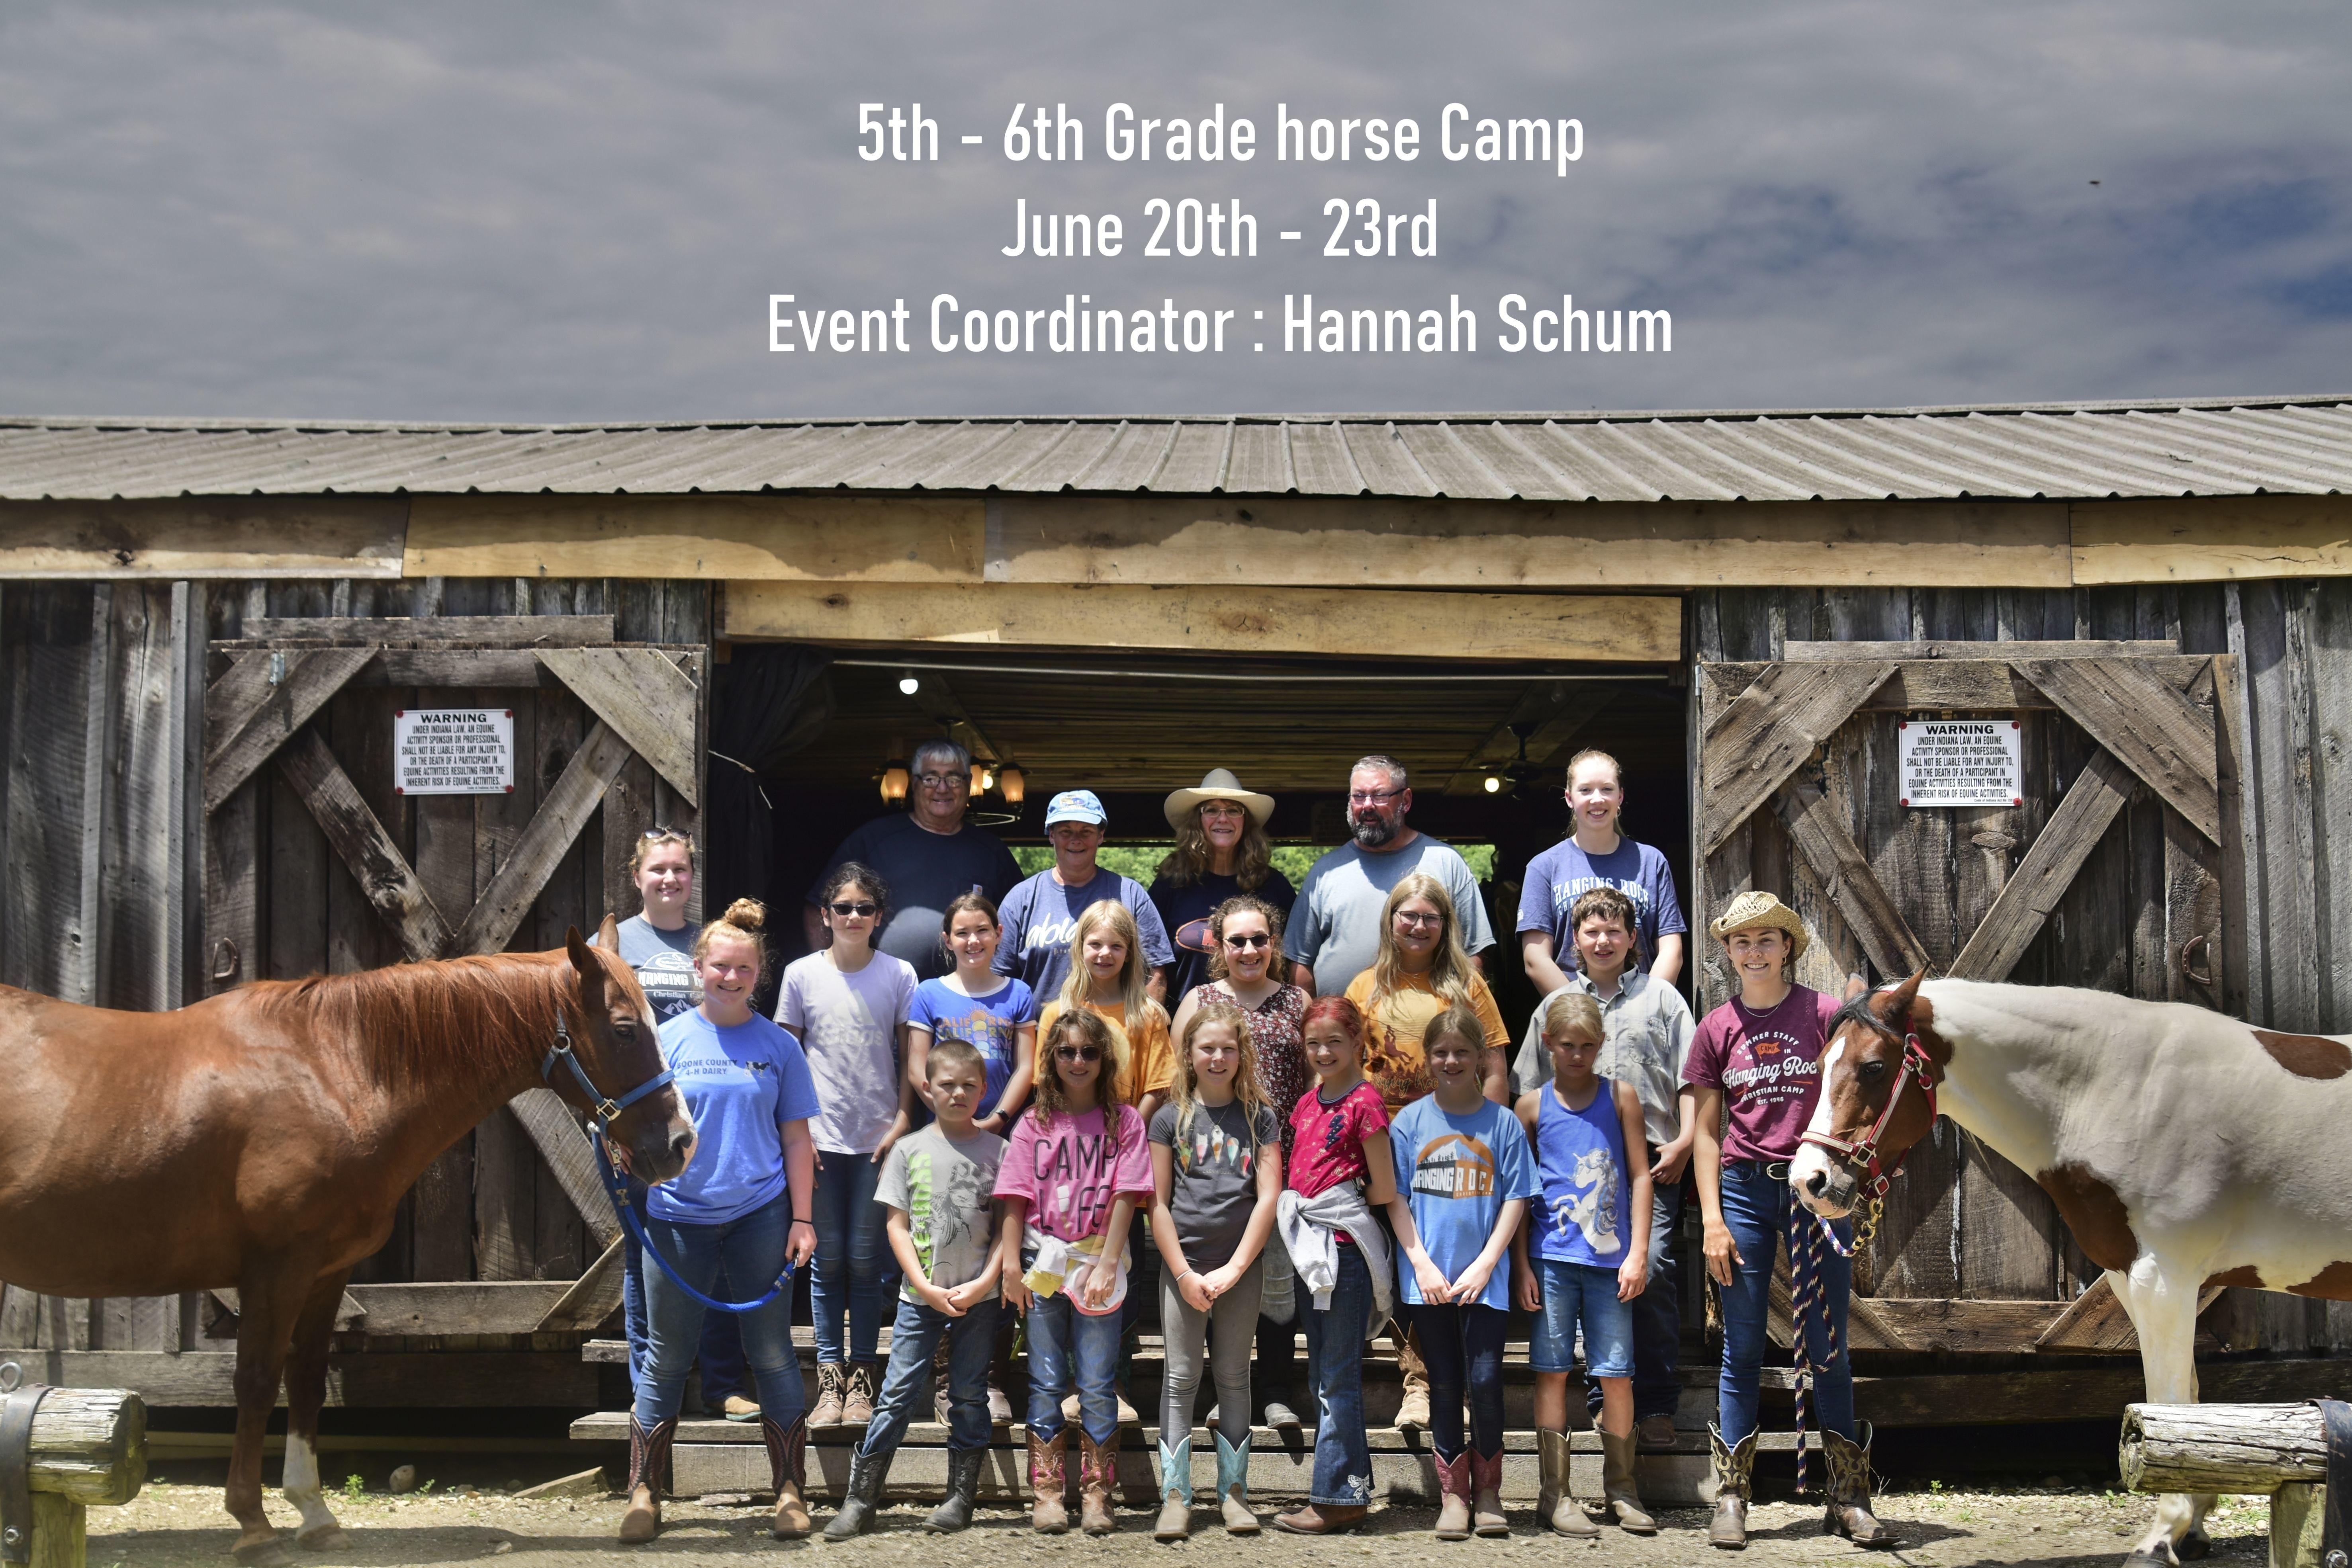 5th & 6th Grade Horse Camp